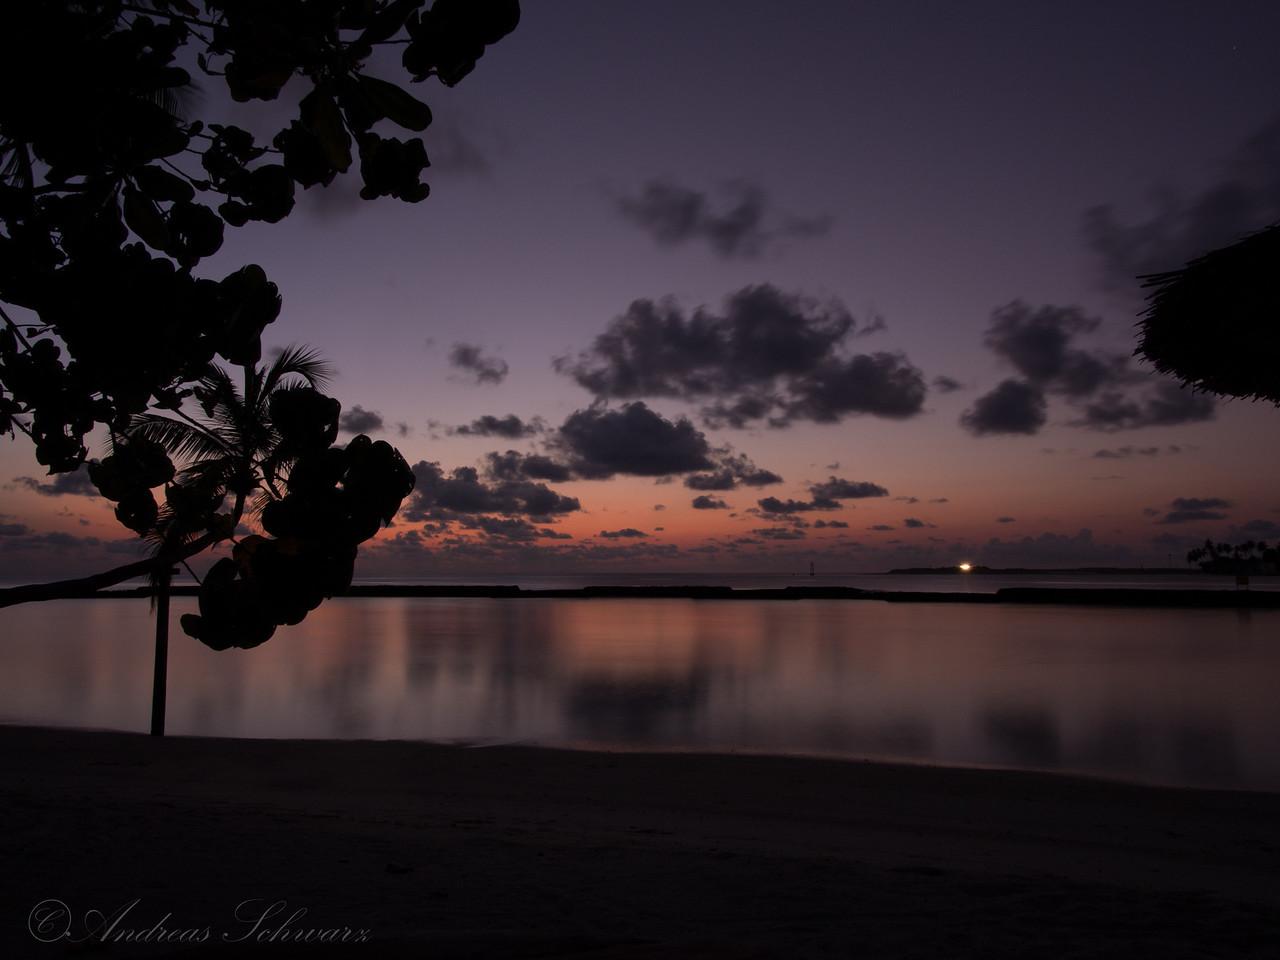 Sunrise on Beach, Maldives 2014